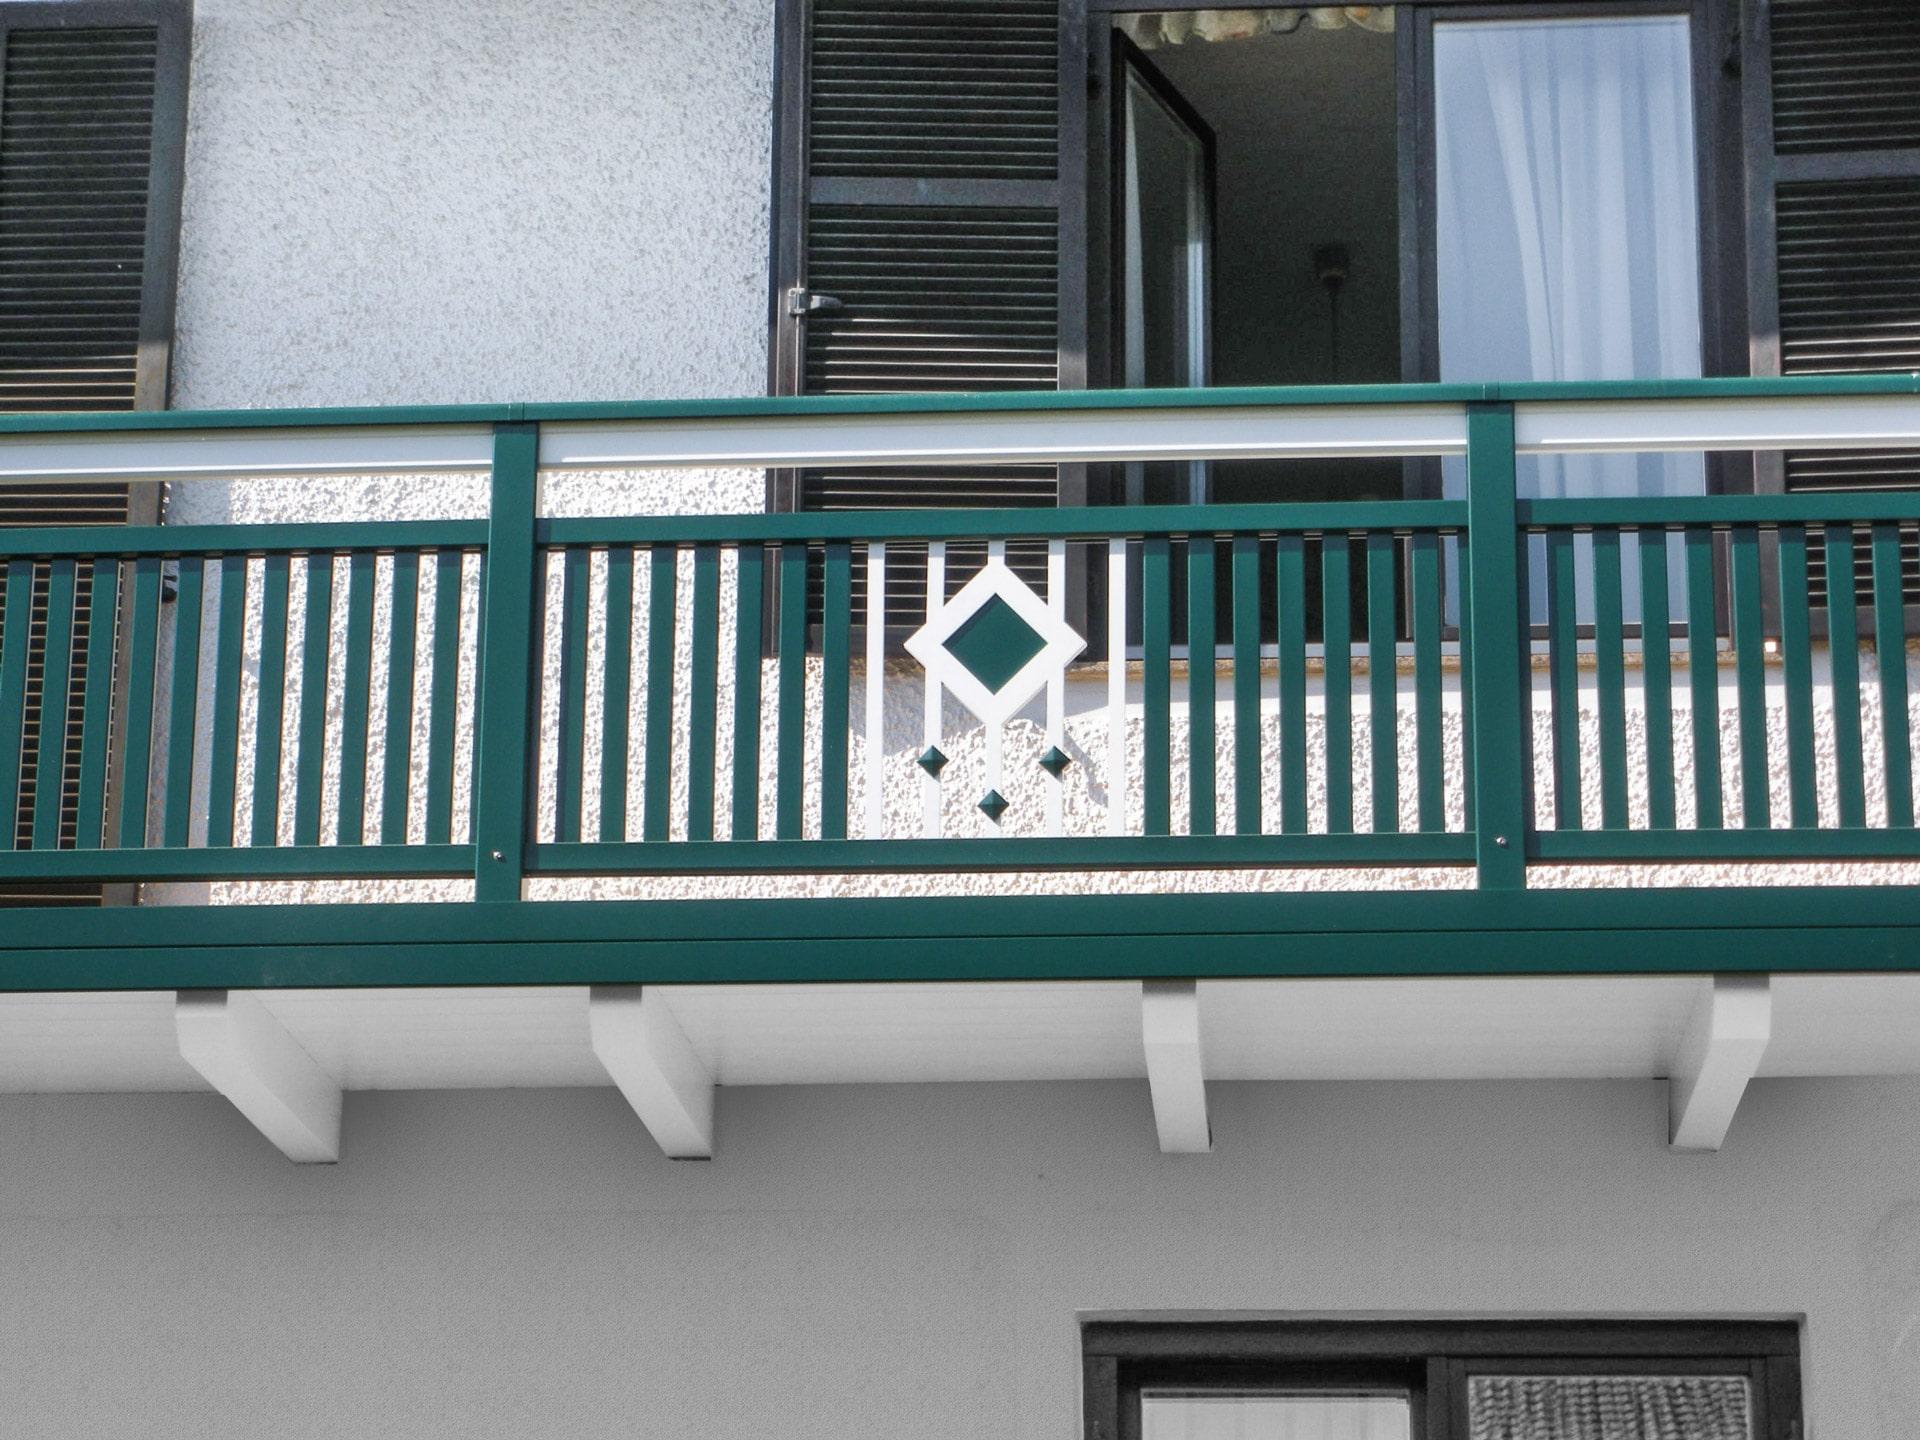 Brunn 01 b   Aufgesetztern Aluminiumlattenbalkon grün mit weißem Stab-Quadrat Dekor   Svoboda